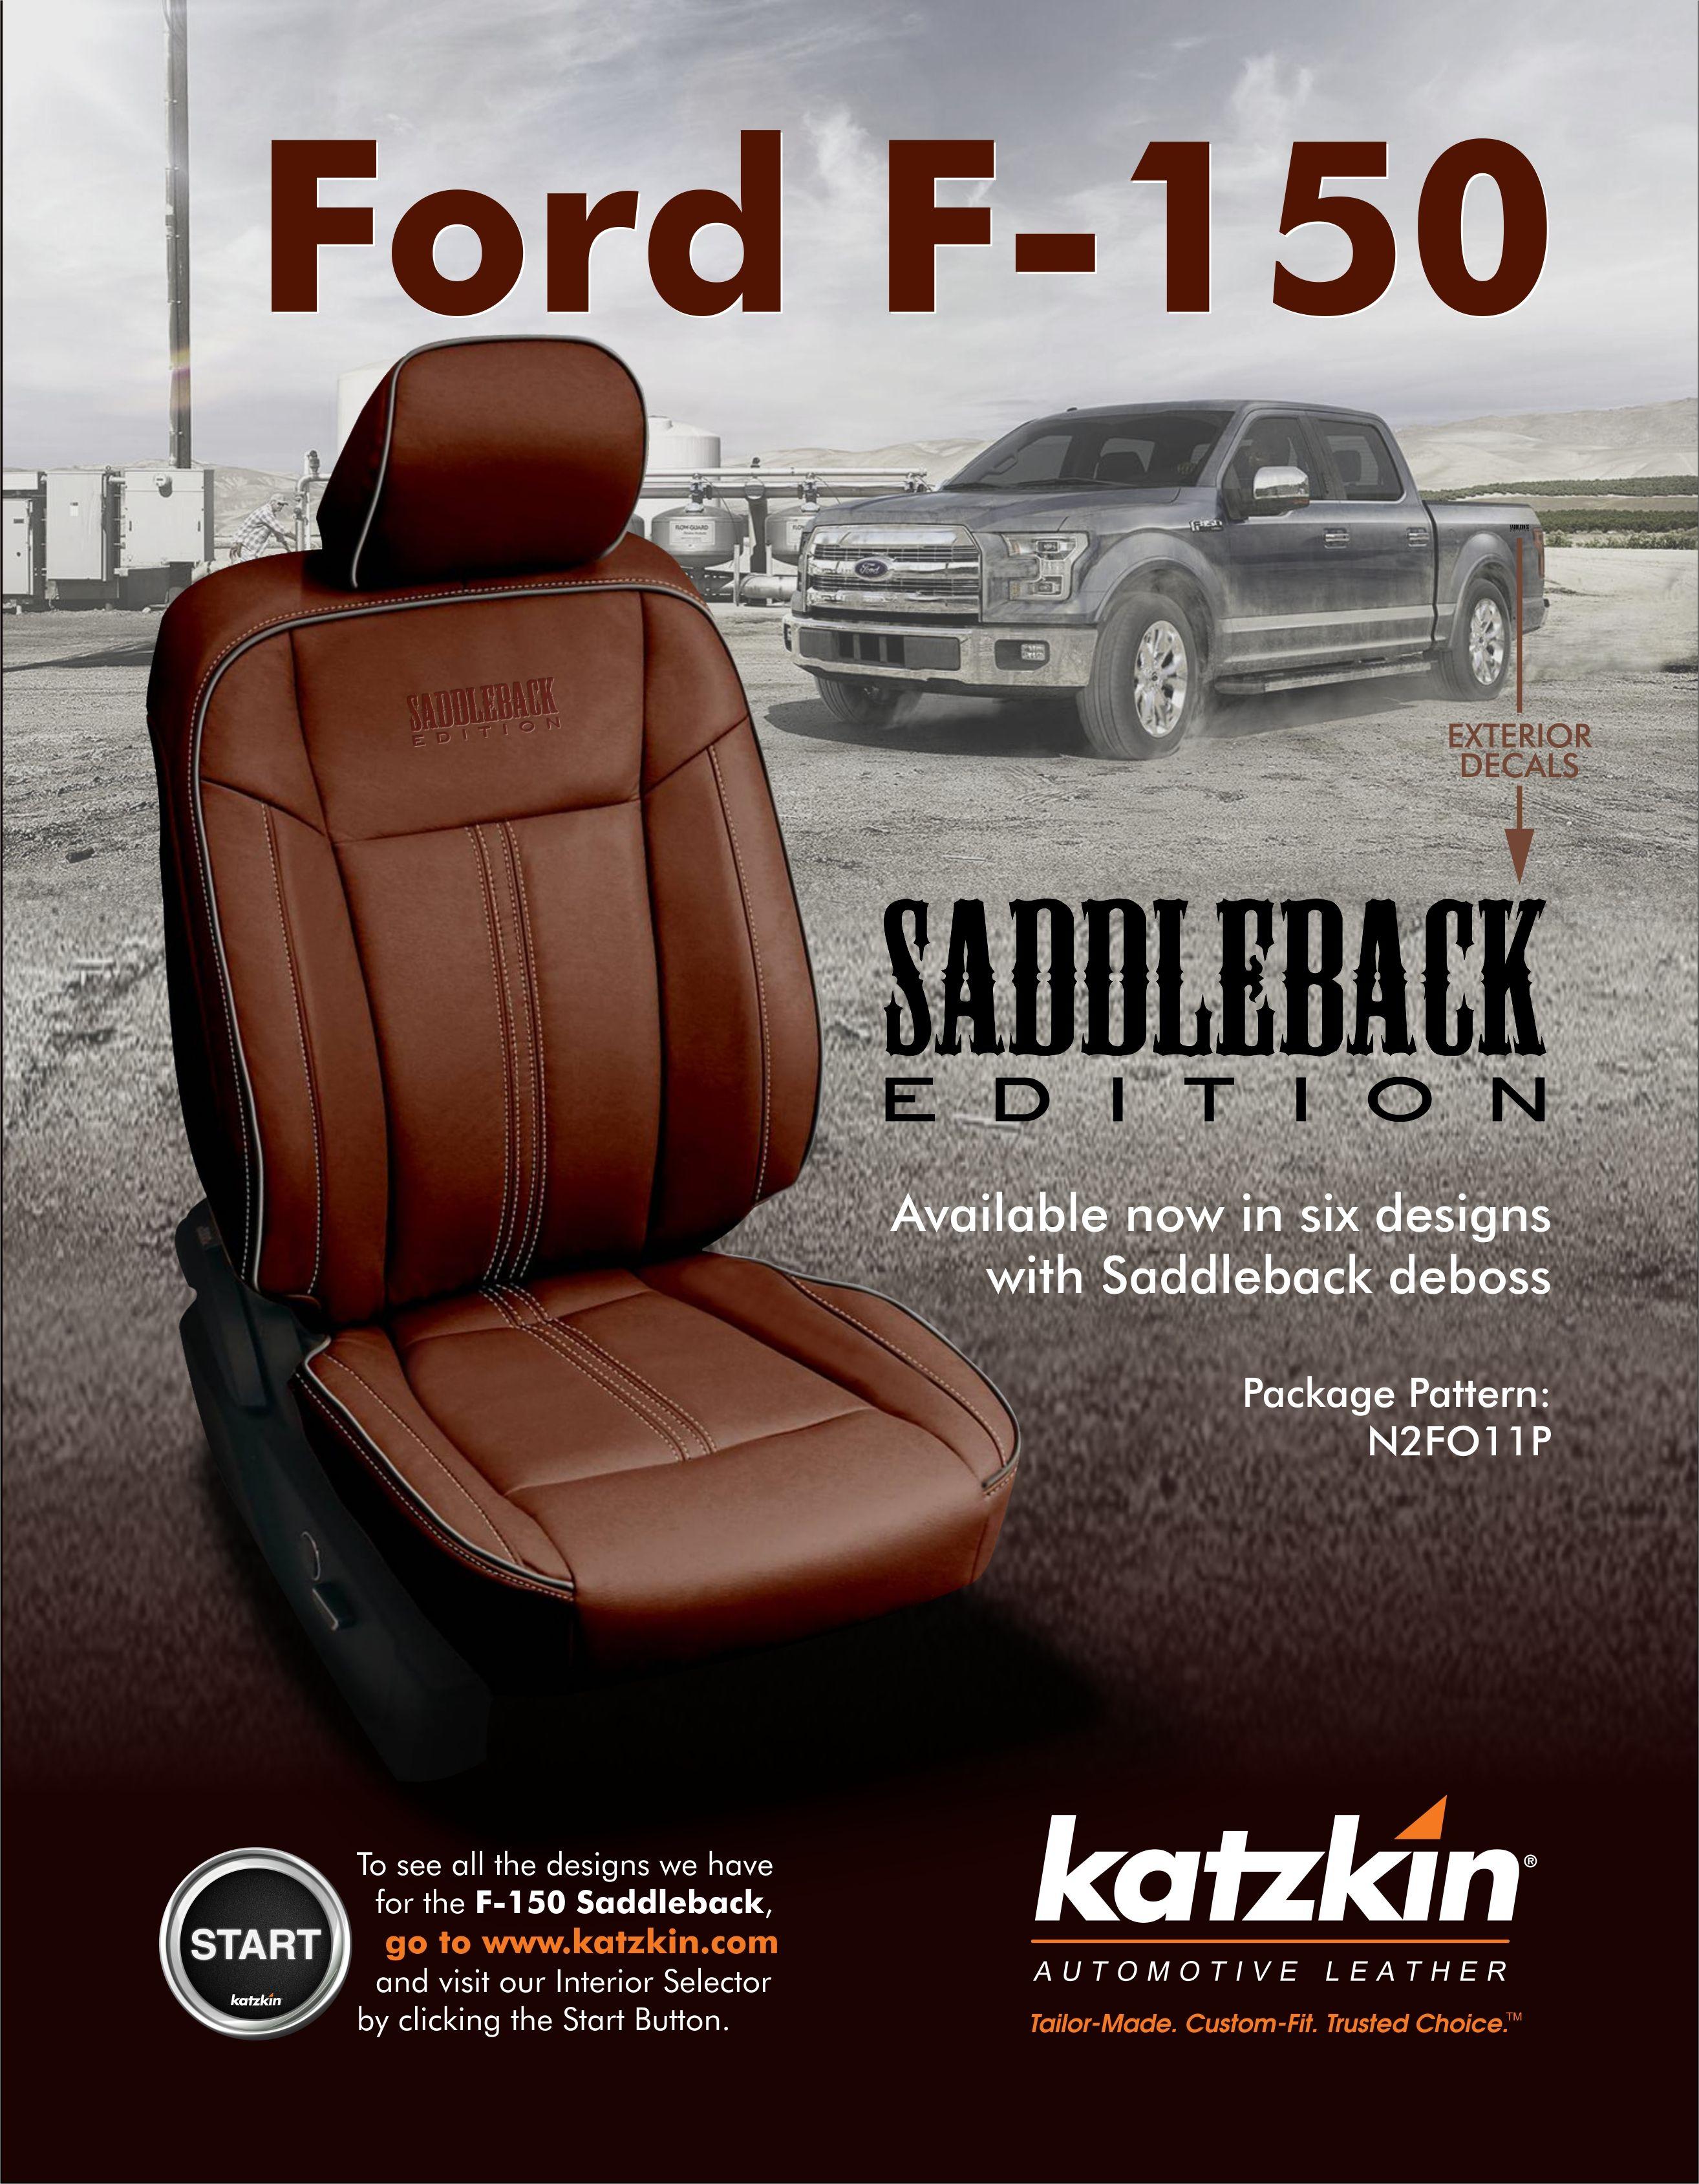 2015 Ford F-150 Saddleback Edition